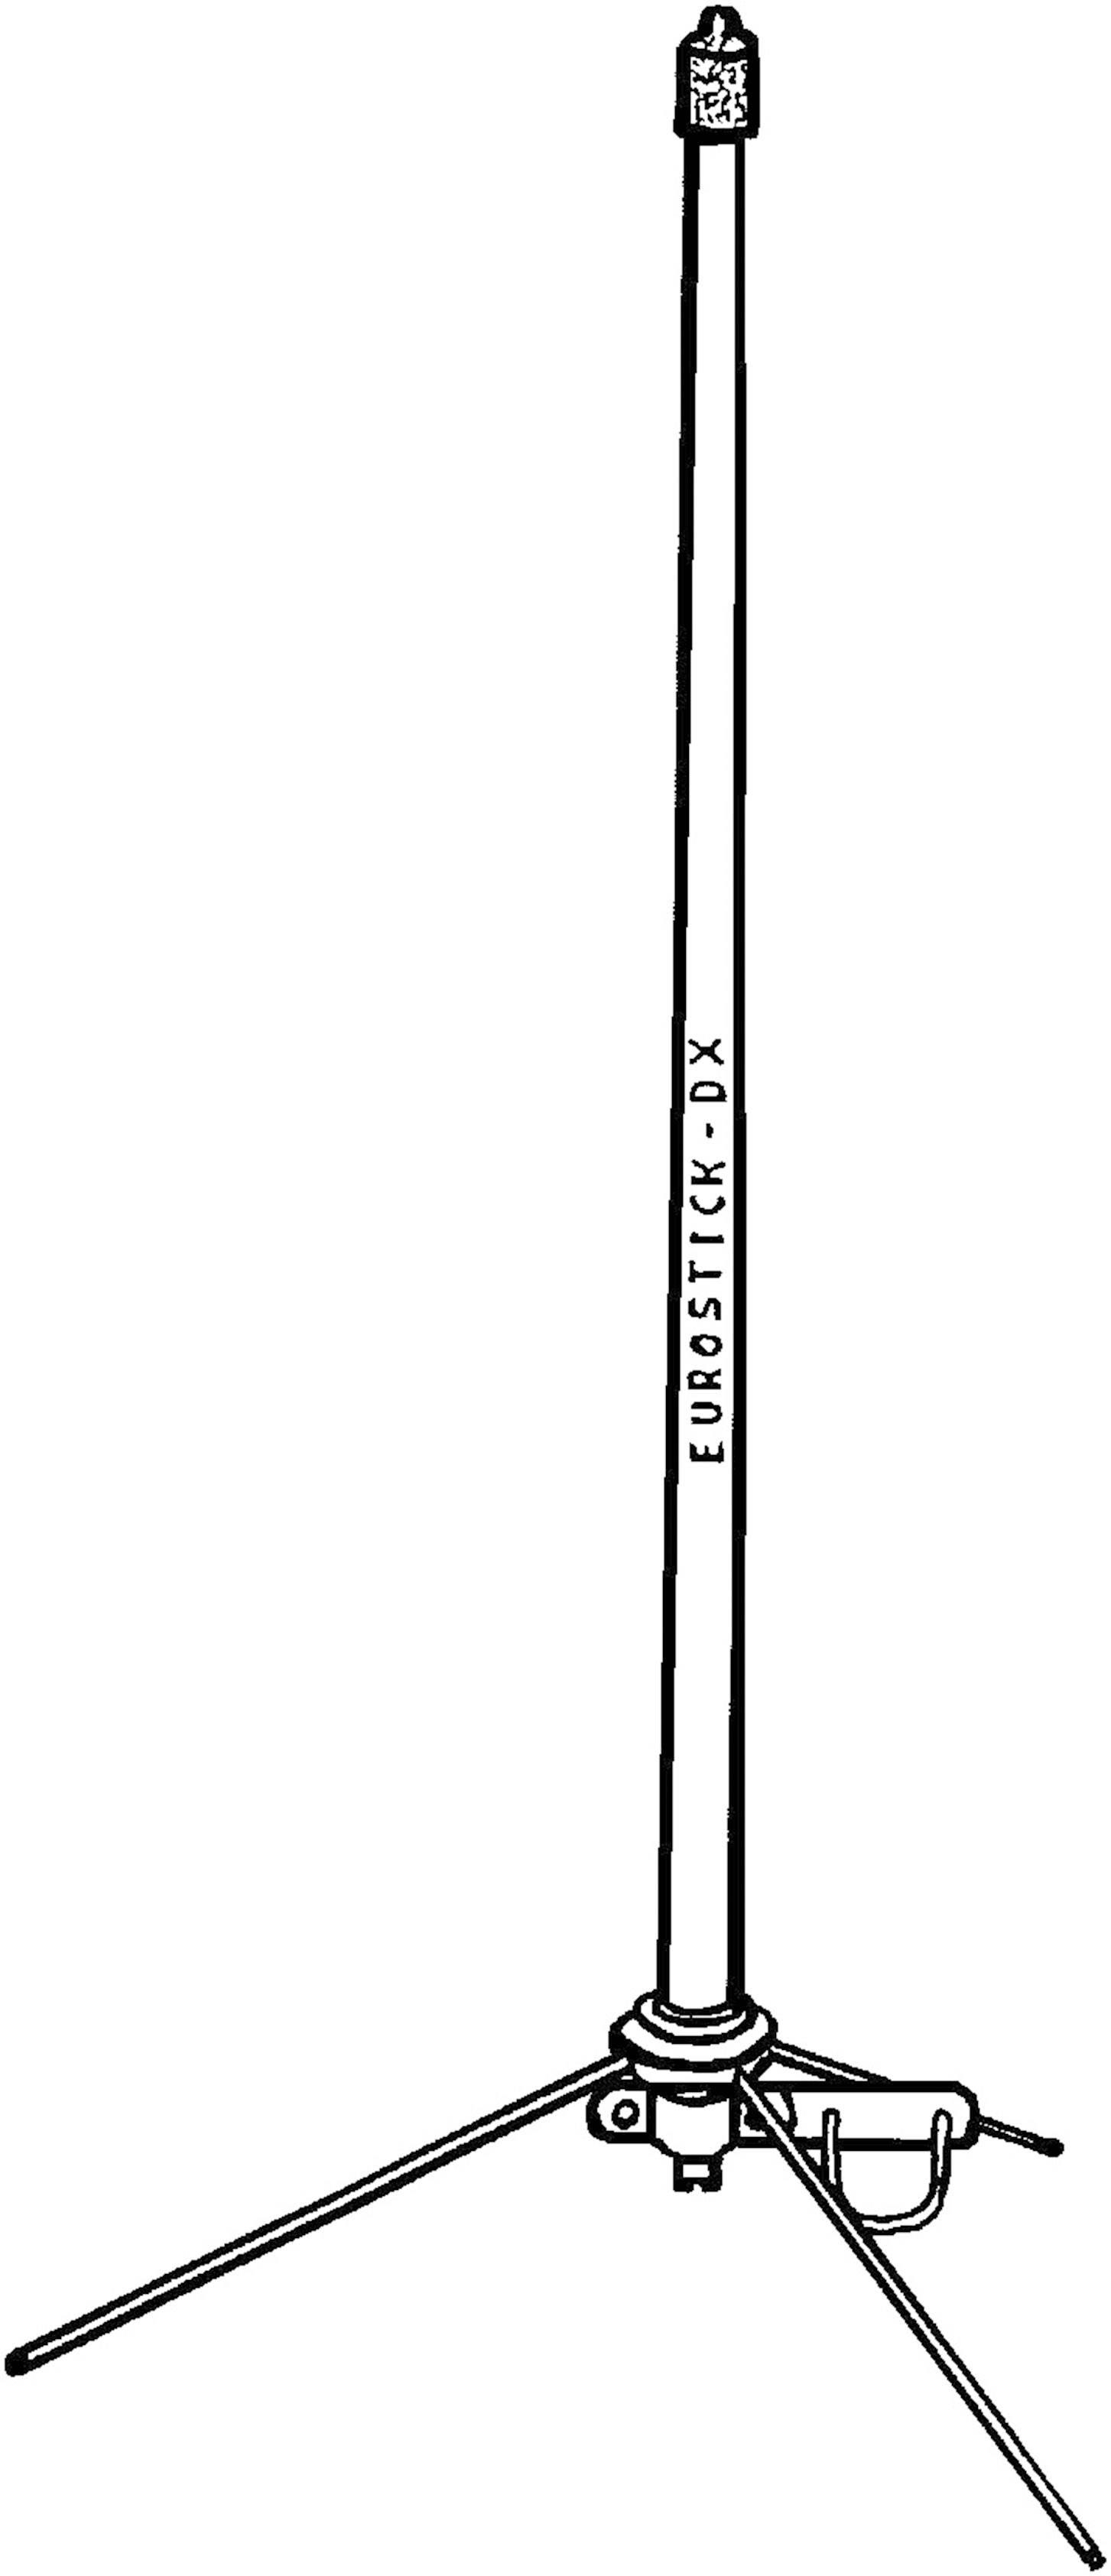 Skenovacia anténa stacionárna Albrecht 6164 Eurostick DX